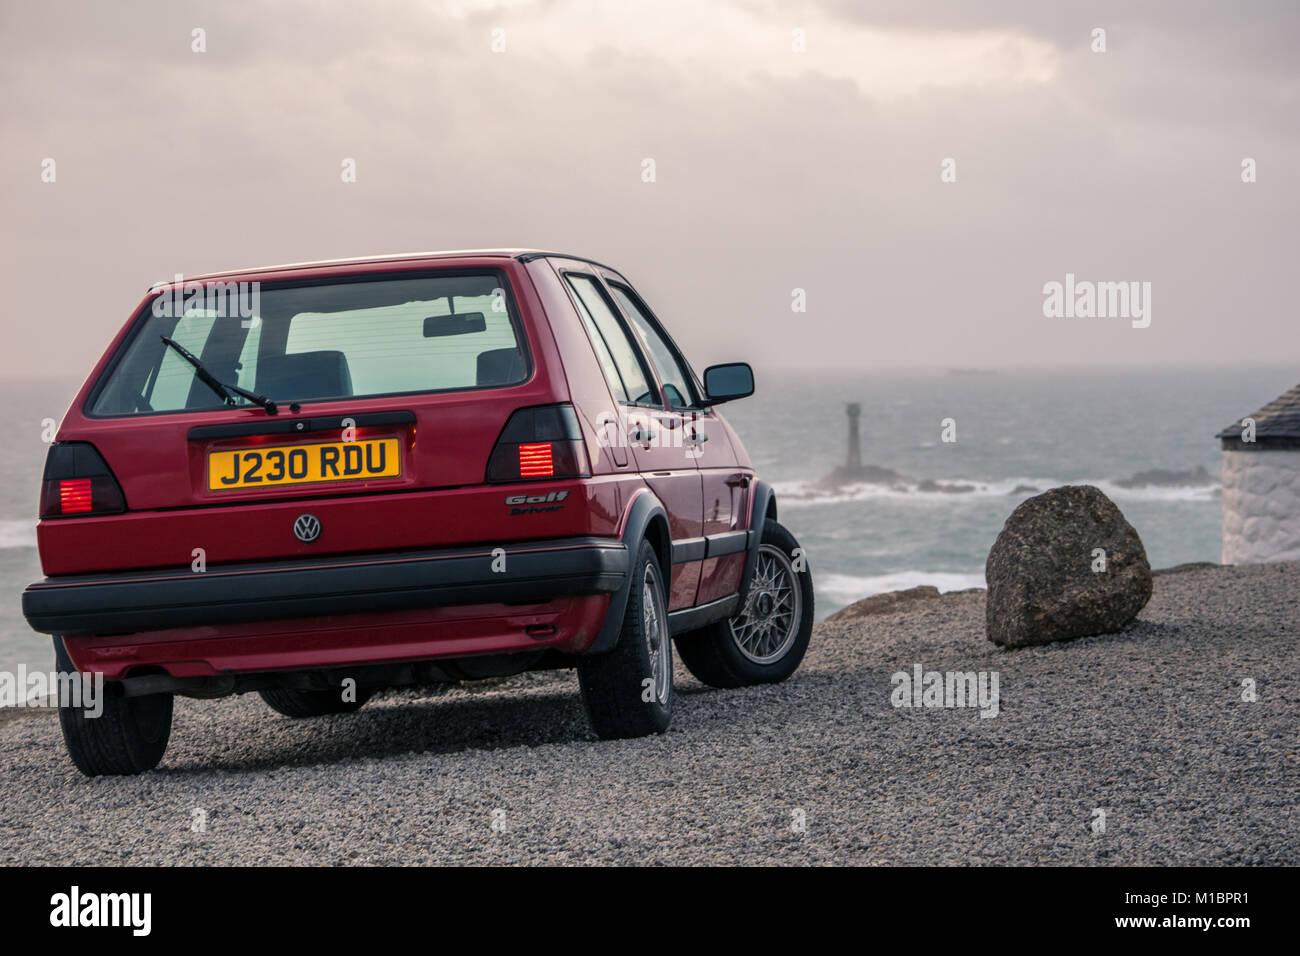 VW Golf MKII ShowCar Land's End Cornwall - Stock Image